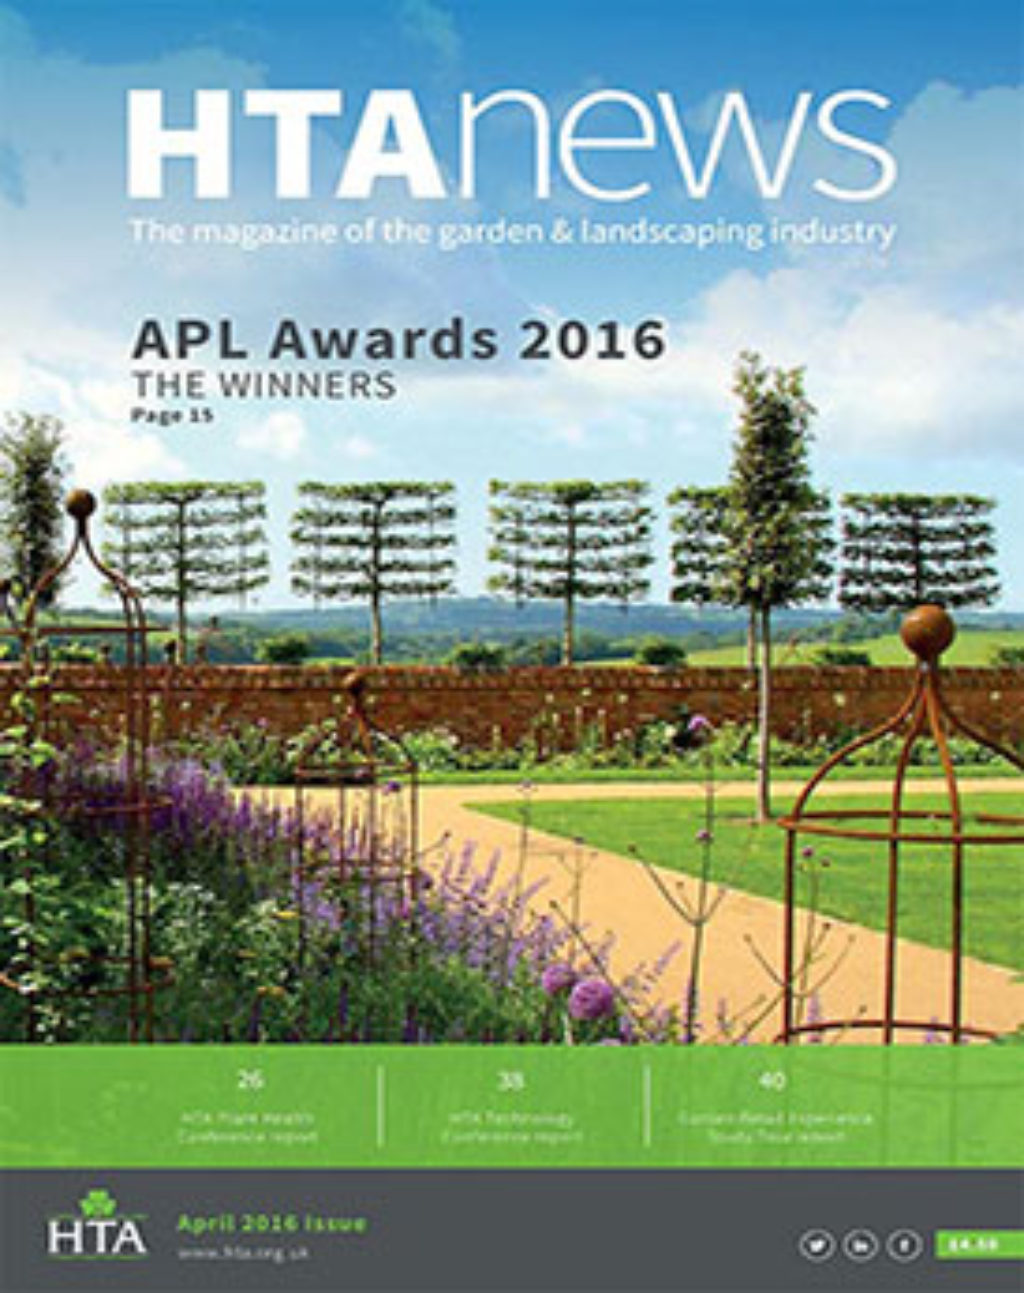 HTA News April 2016